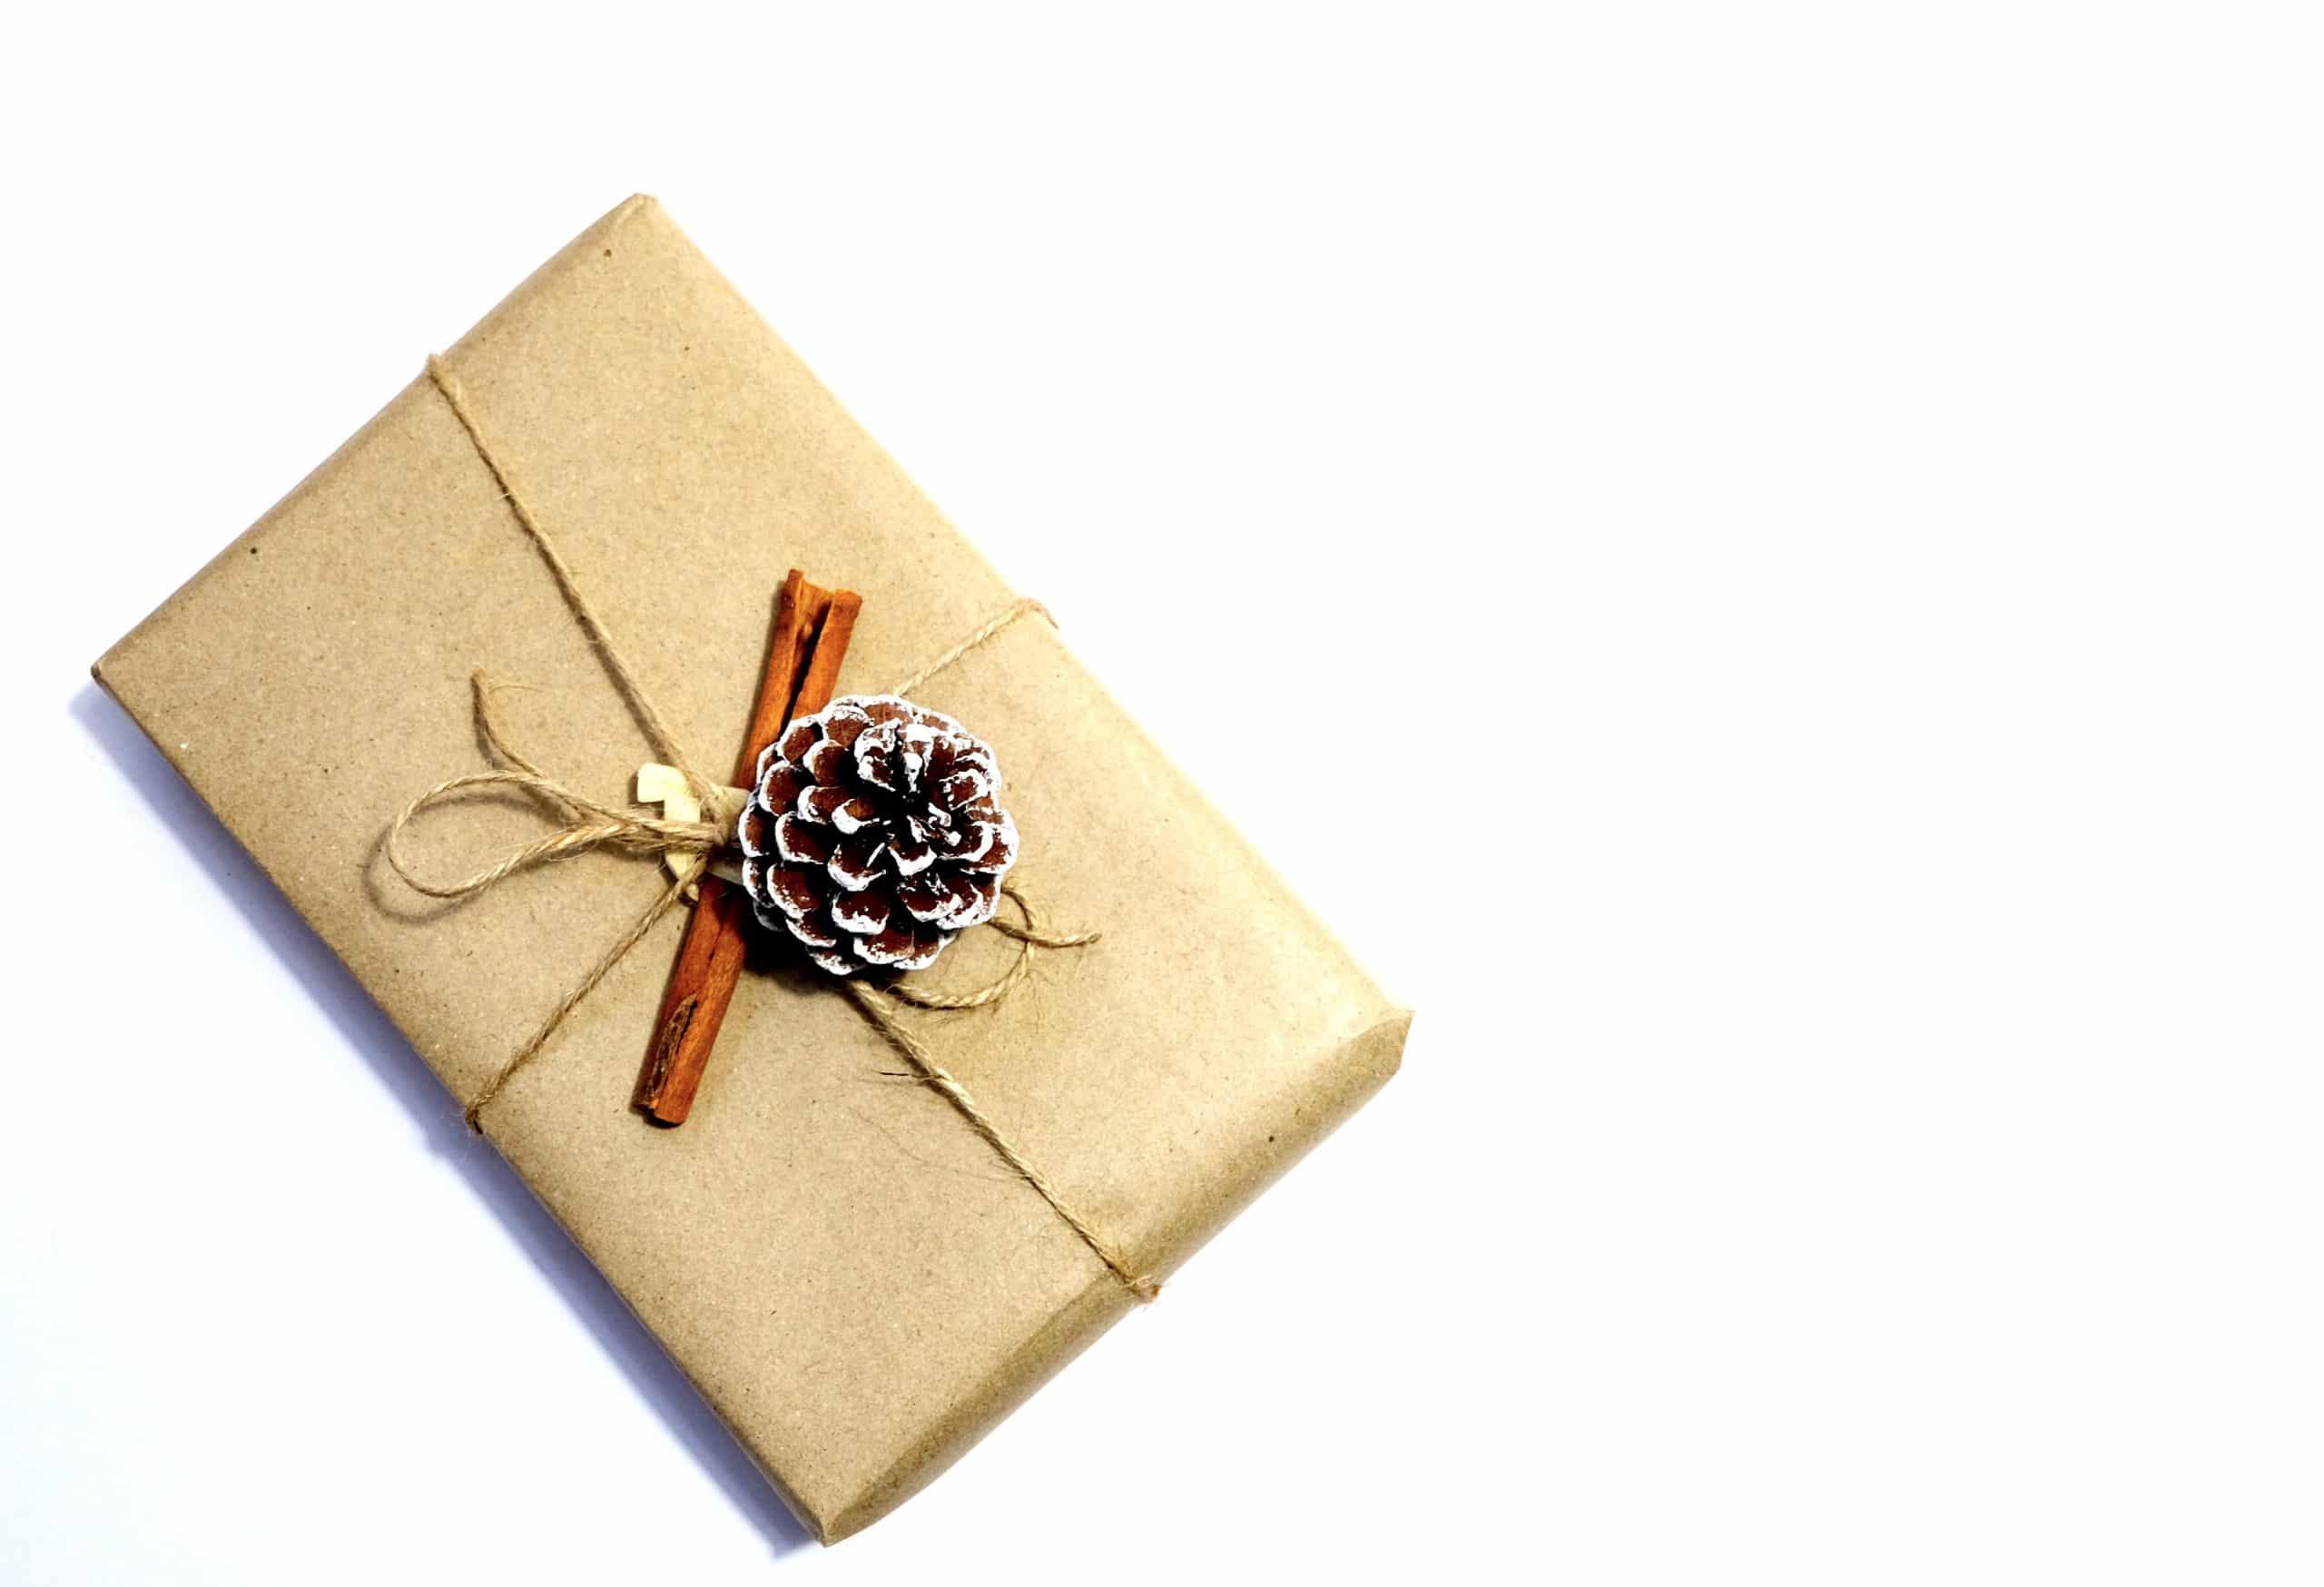 cadeau ingepakt met bruin papier kaneelstokje en dennenappel